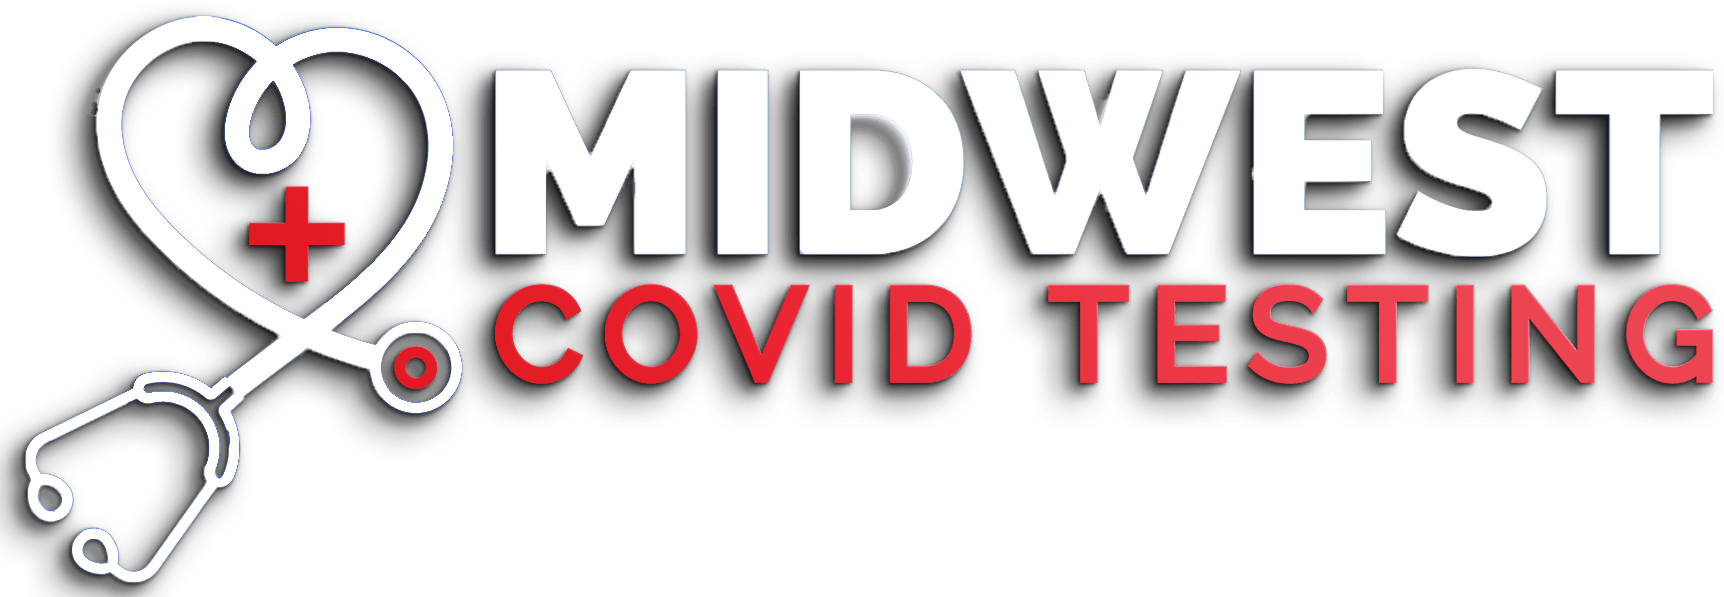 COVID Testing and Rapid Testing in Woodridge, IL | Midwest Covid Testing Midwest Covid Testing | Rapid Chicago Covid Testing